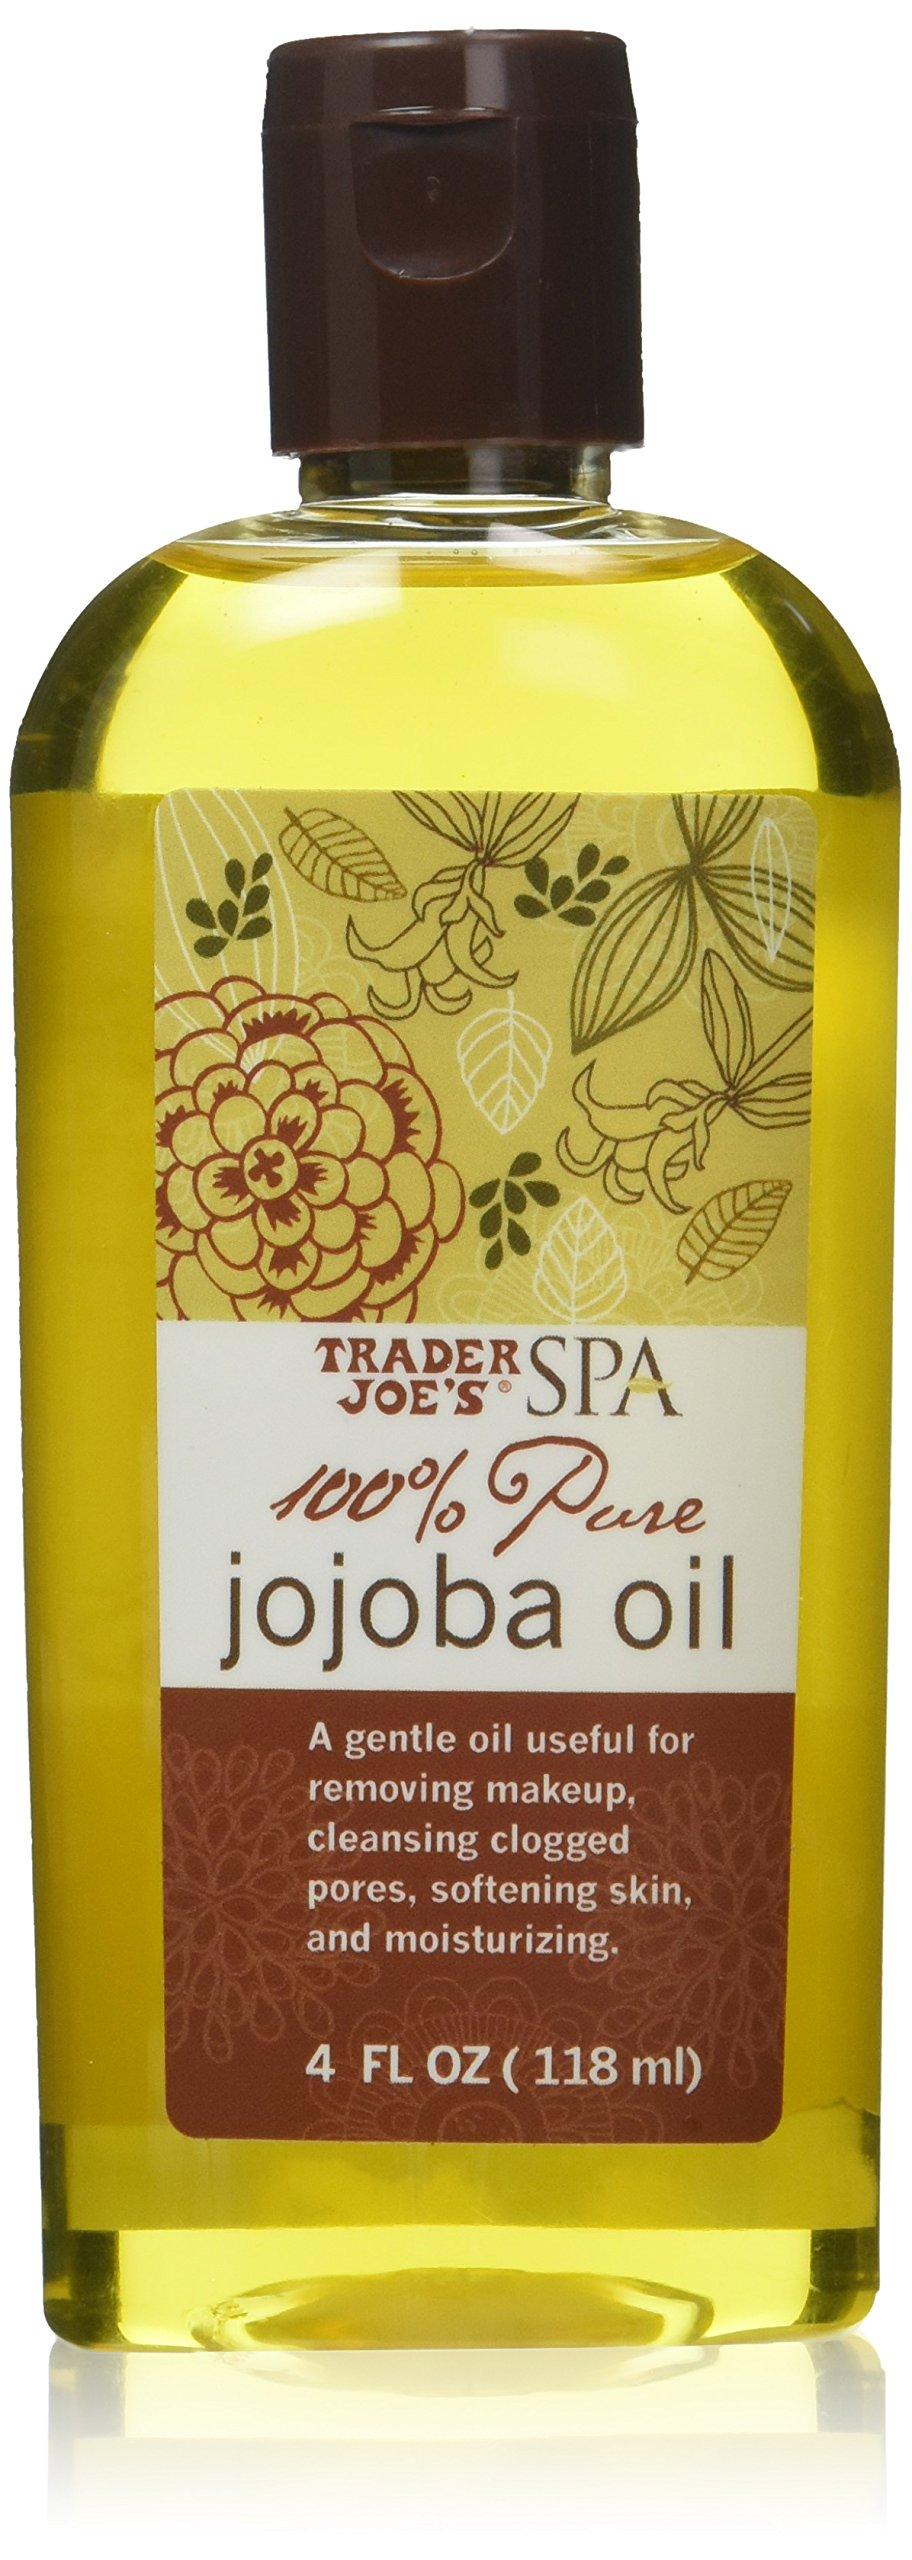 Trader Joes Spa 100% Pure Jojoba Oil